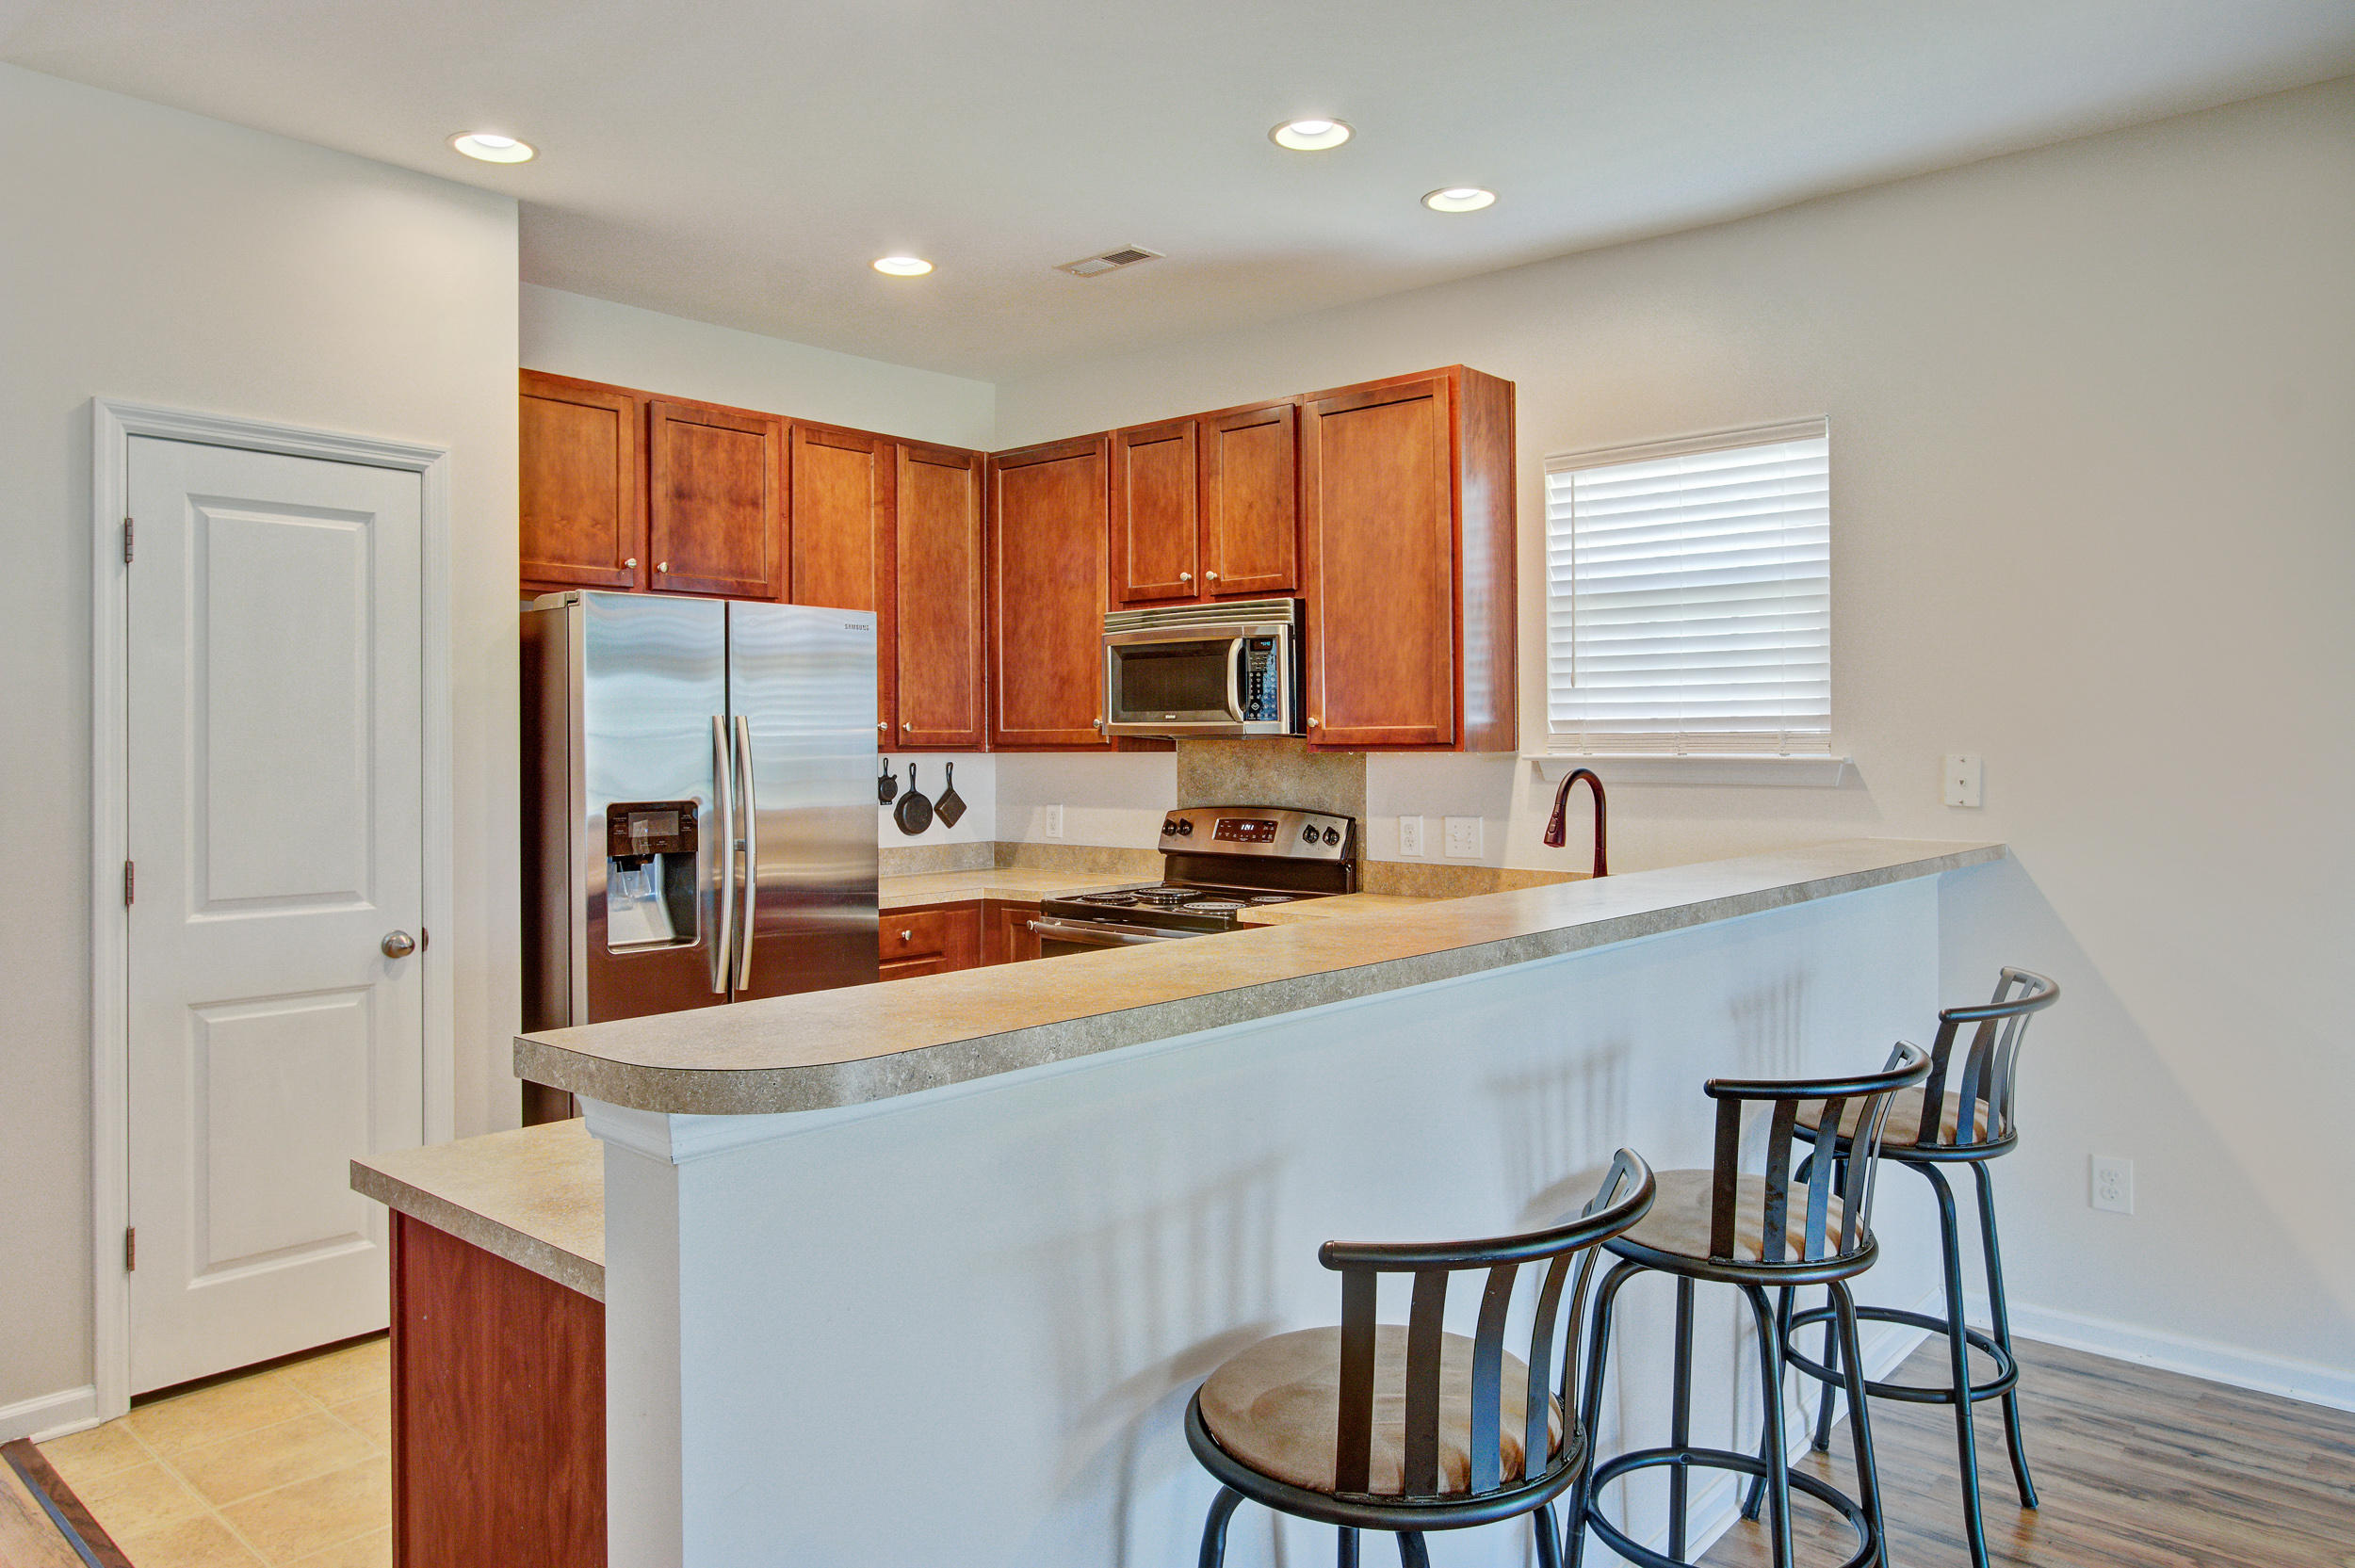 Oakley Pointe Homes For Sale - 576 English Oak, Moncks Corner, SC - 51